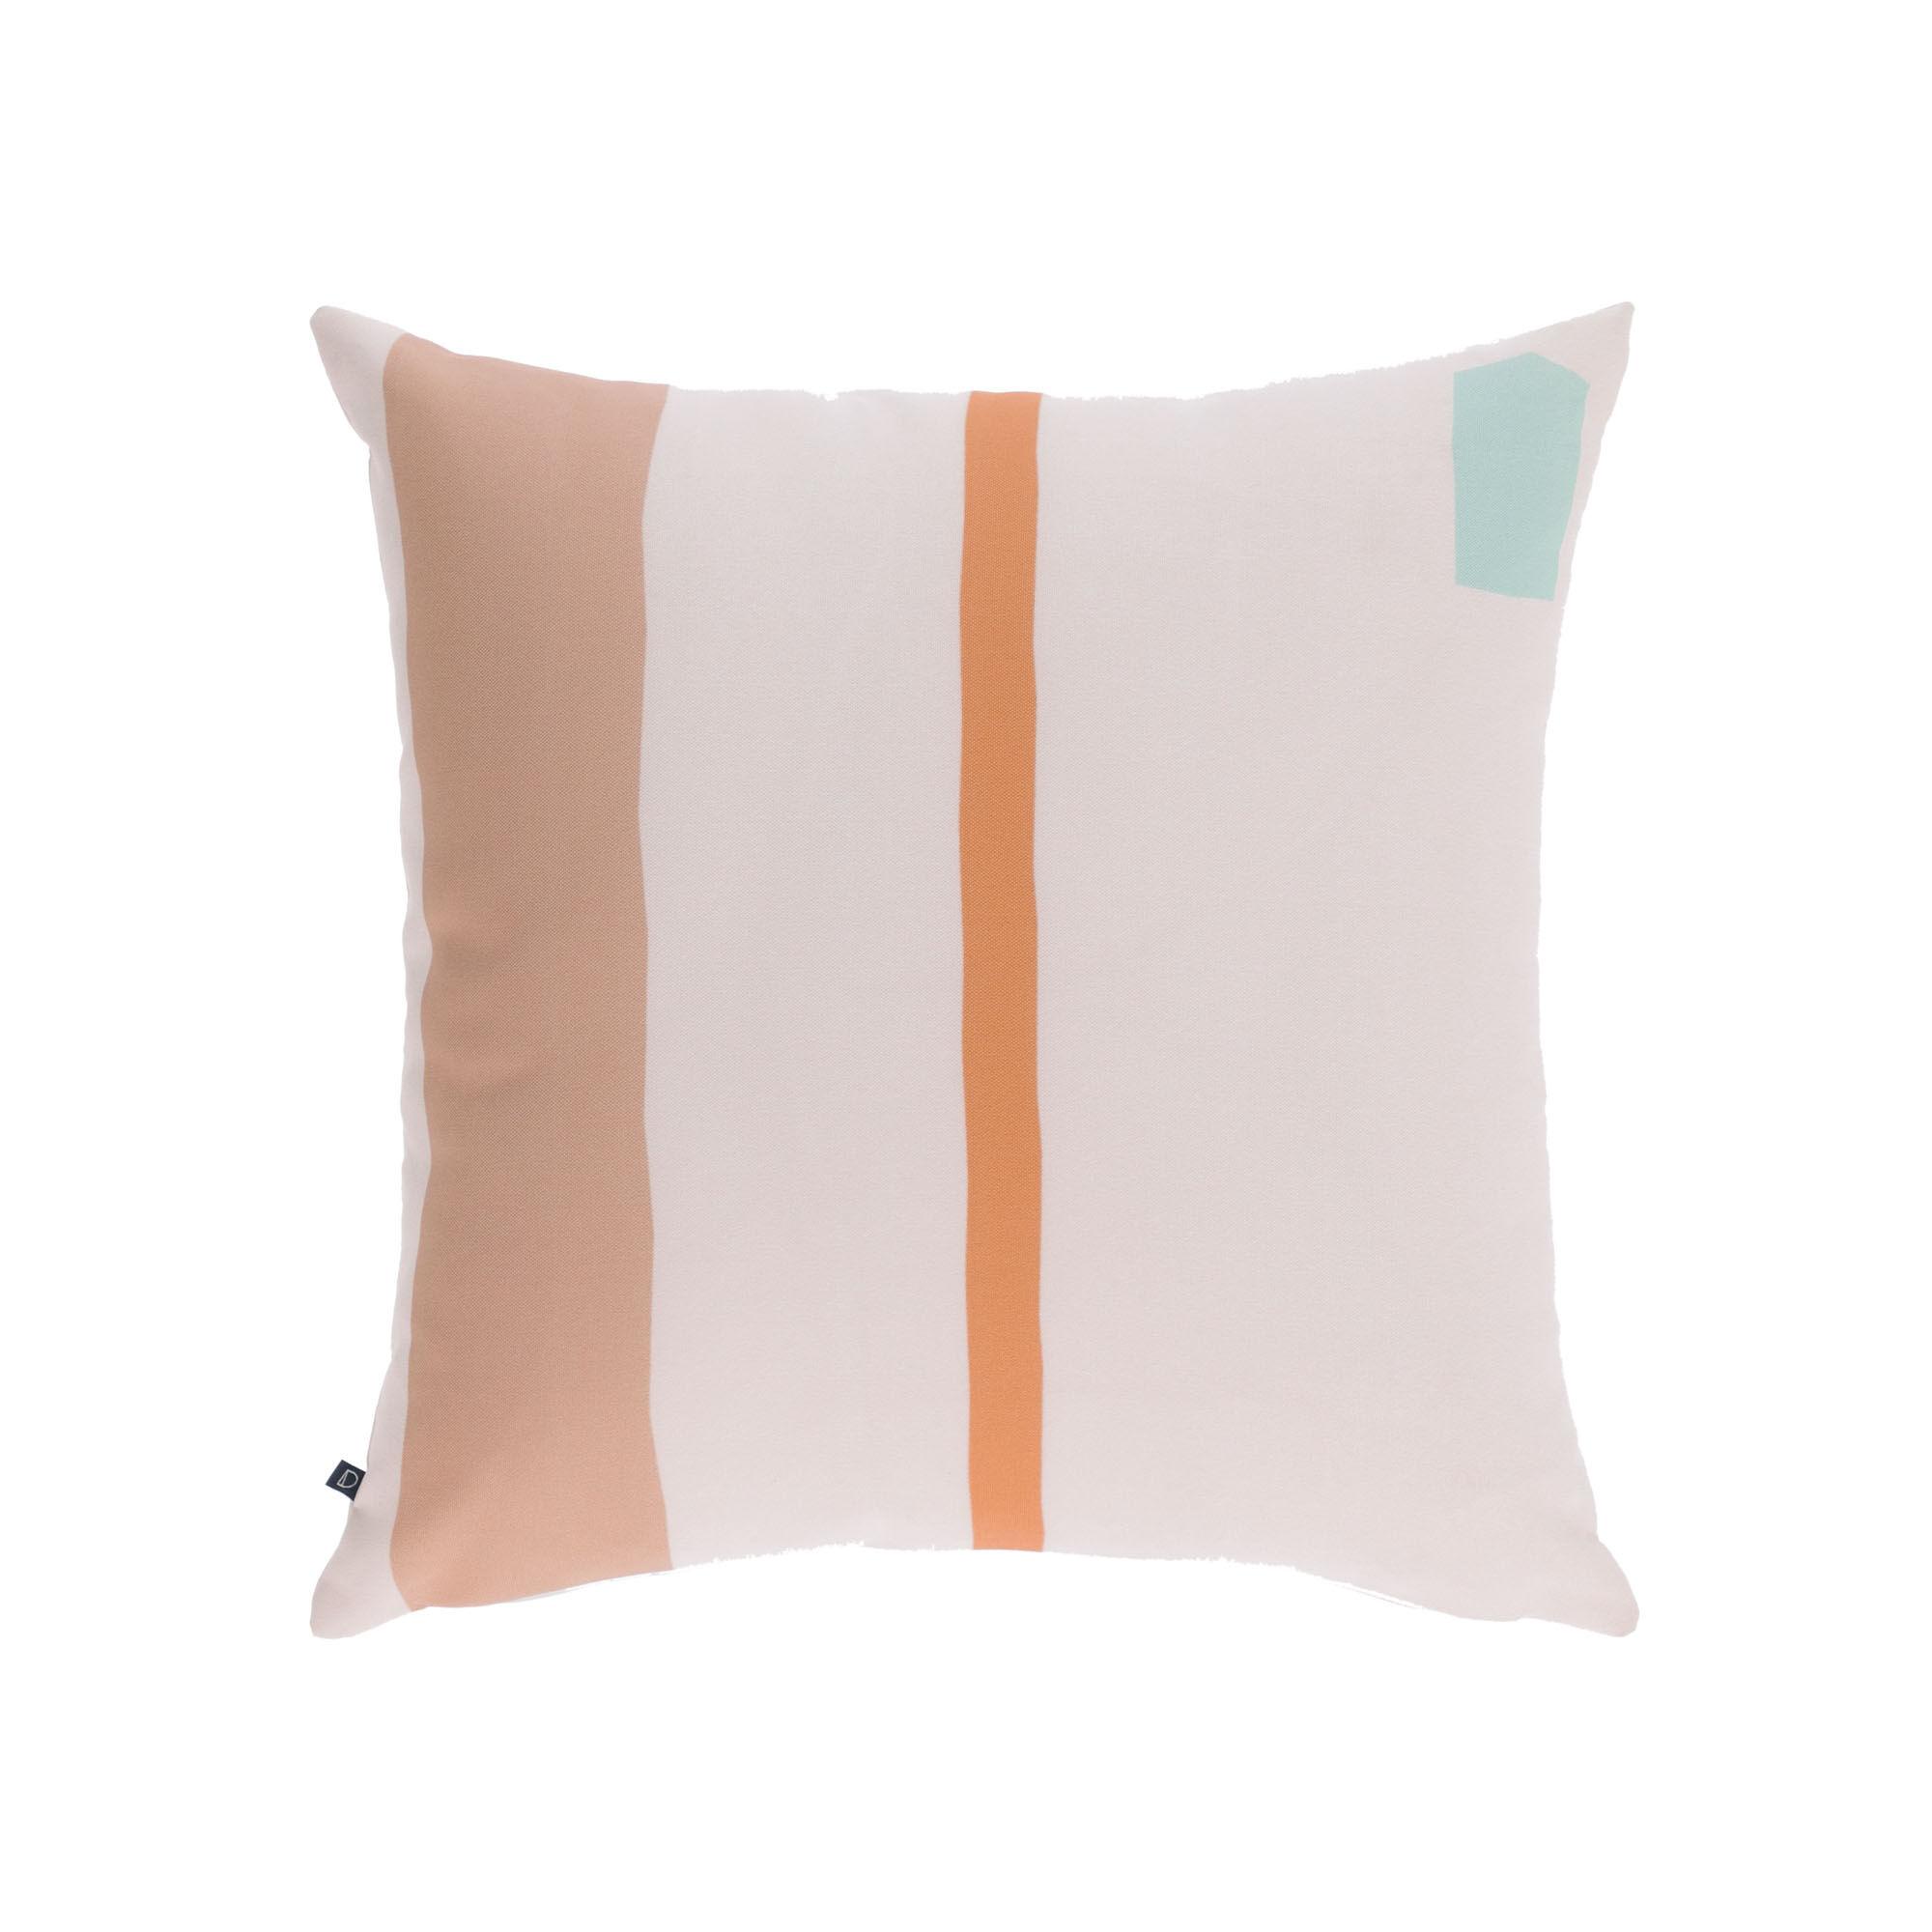 kave home fodera per cuscino calantina righe verticali multicolori 45 x 45 cm